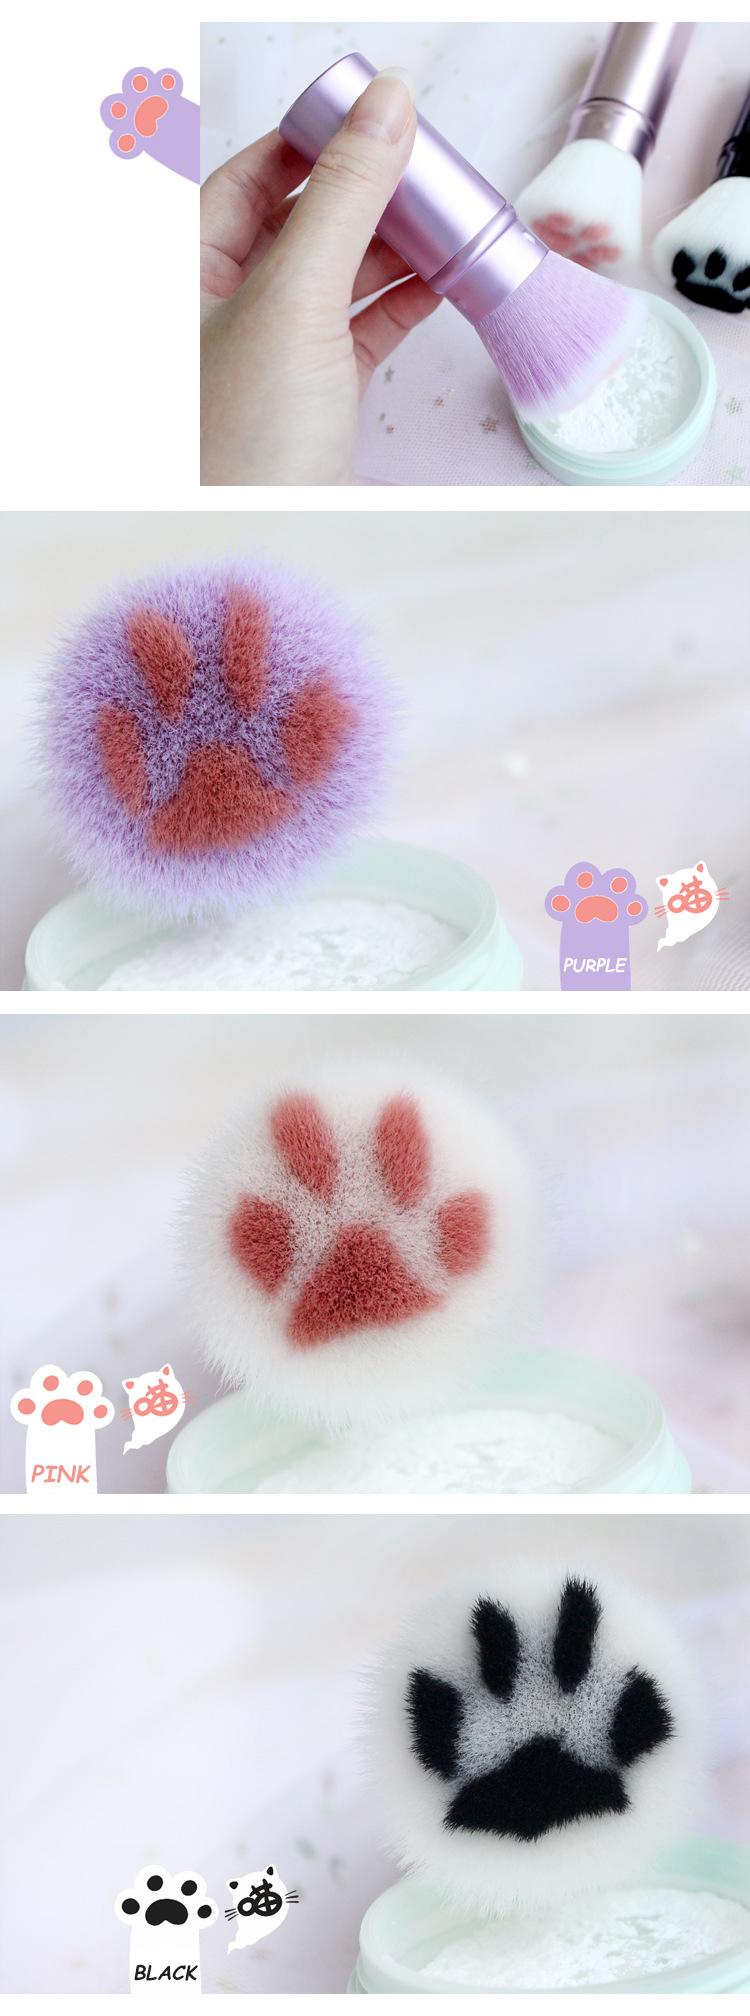 Cute Cat Paw Foundation Blush 4